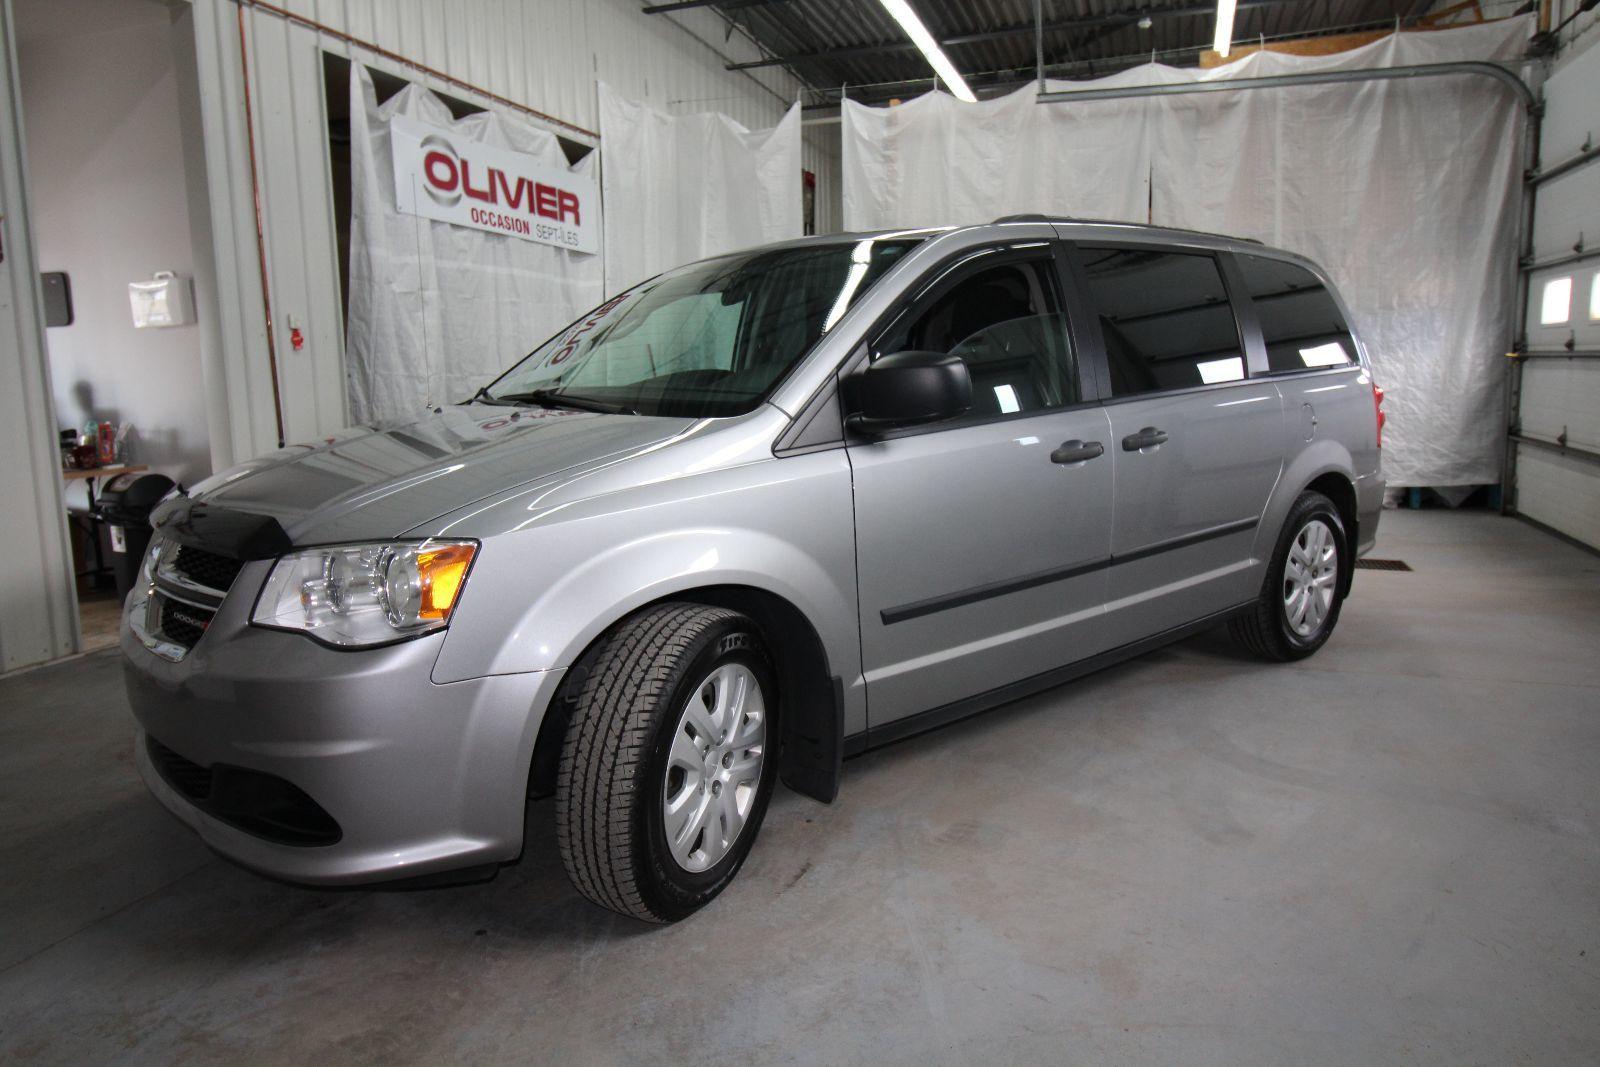 Pre Owned 2014 Dodge Grand Caravan Se In Sept Iles Qubec Inventory Olivier Occasion Quebec